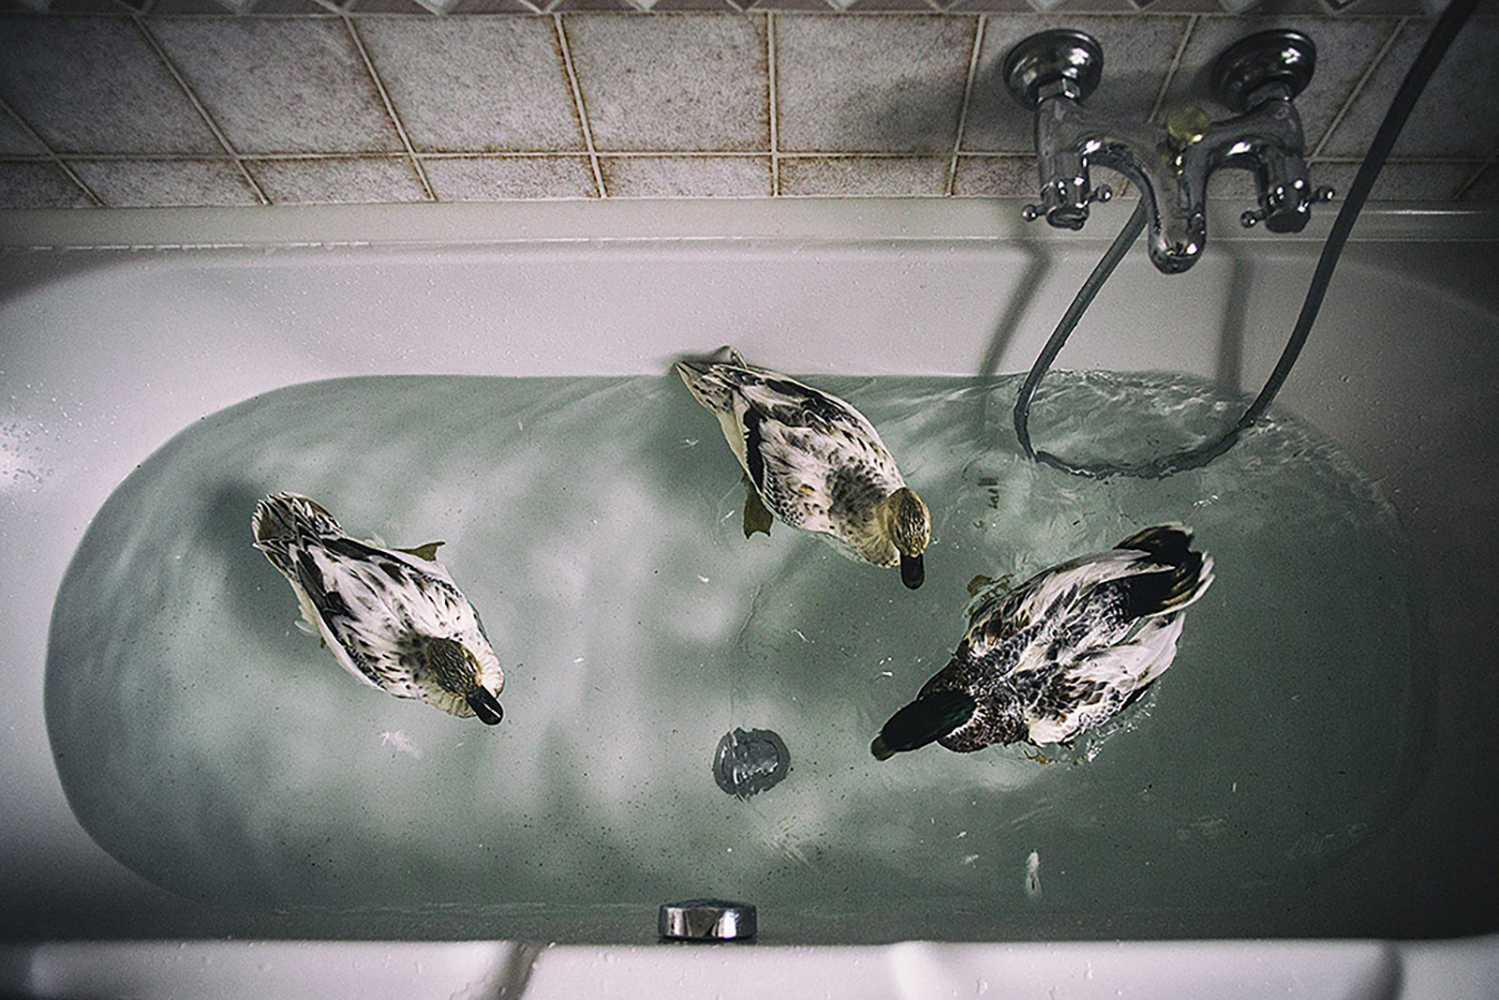 Ducks swim in Sgambati's home.